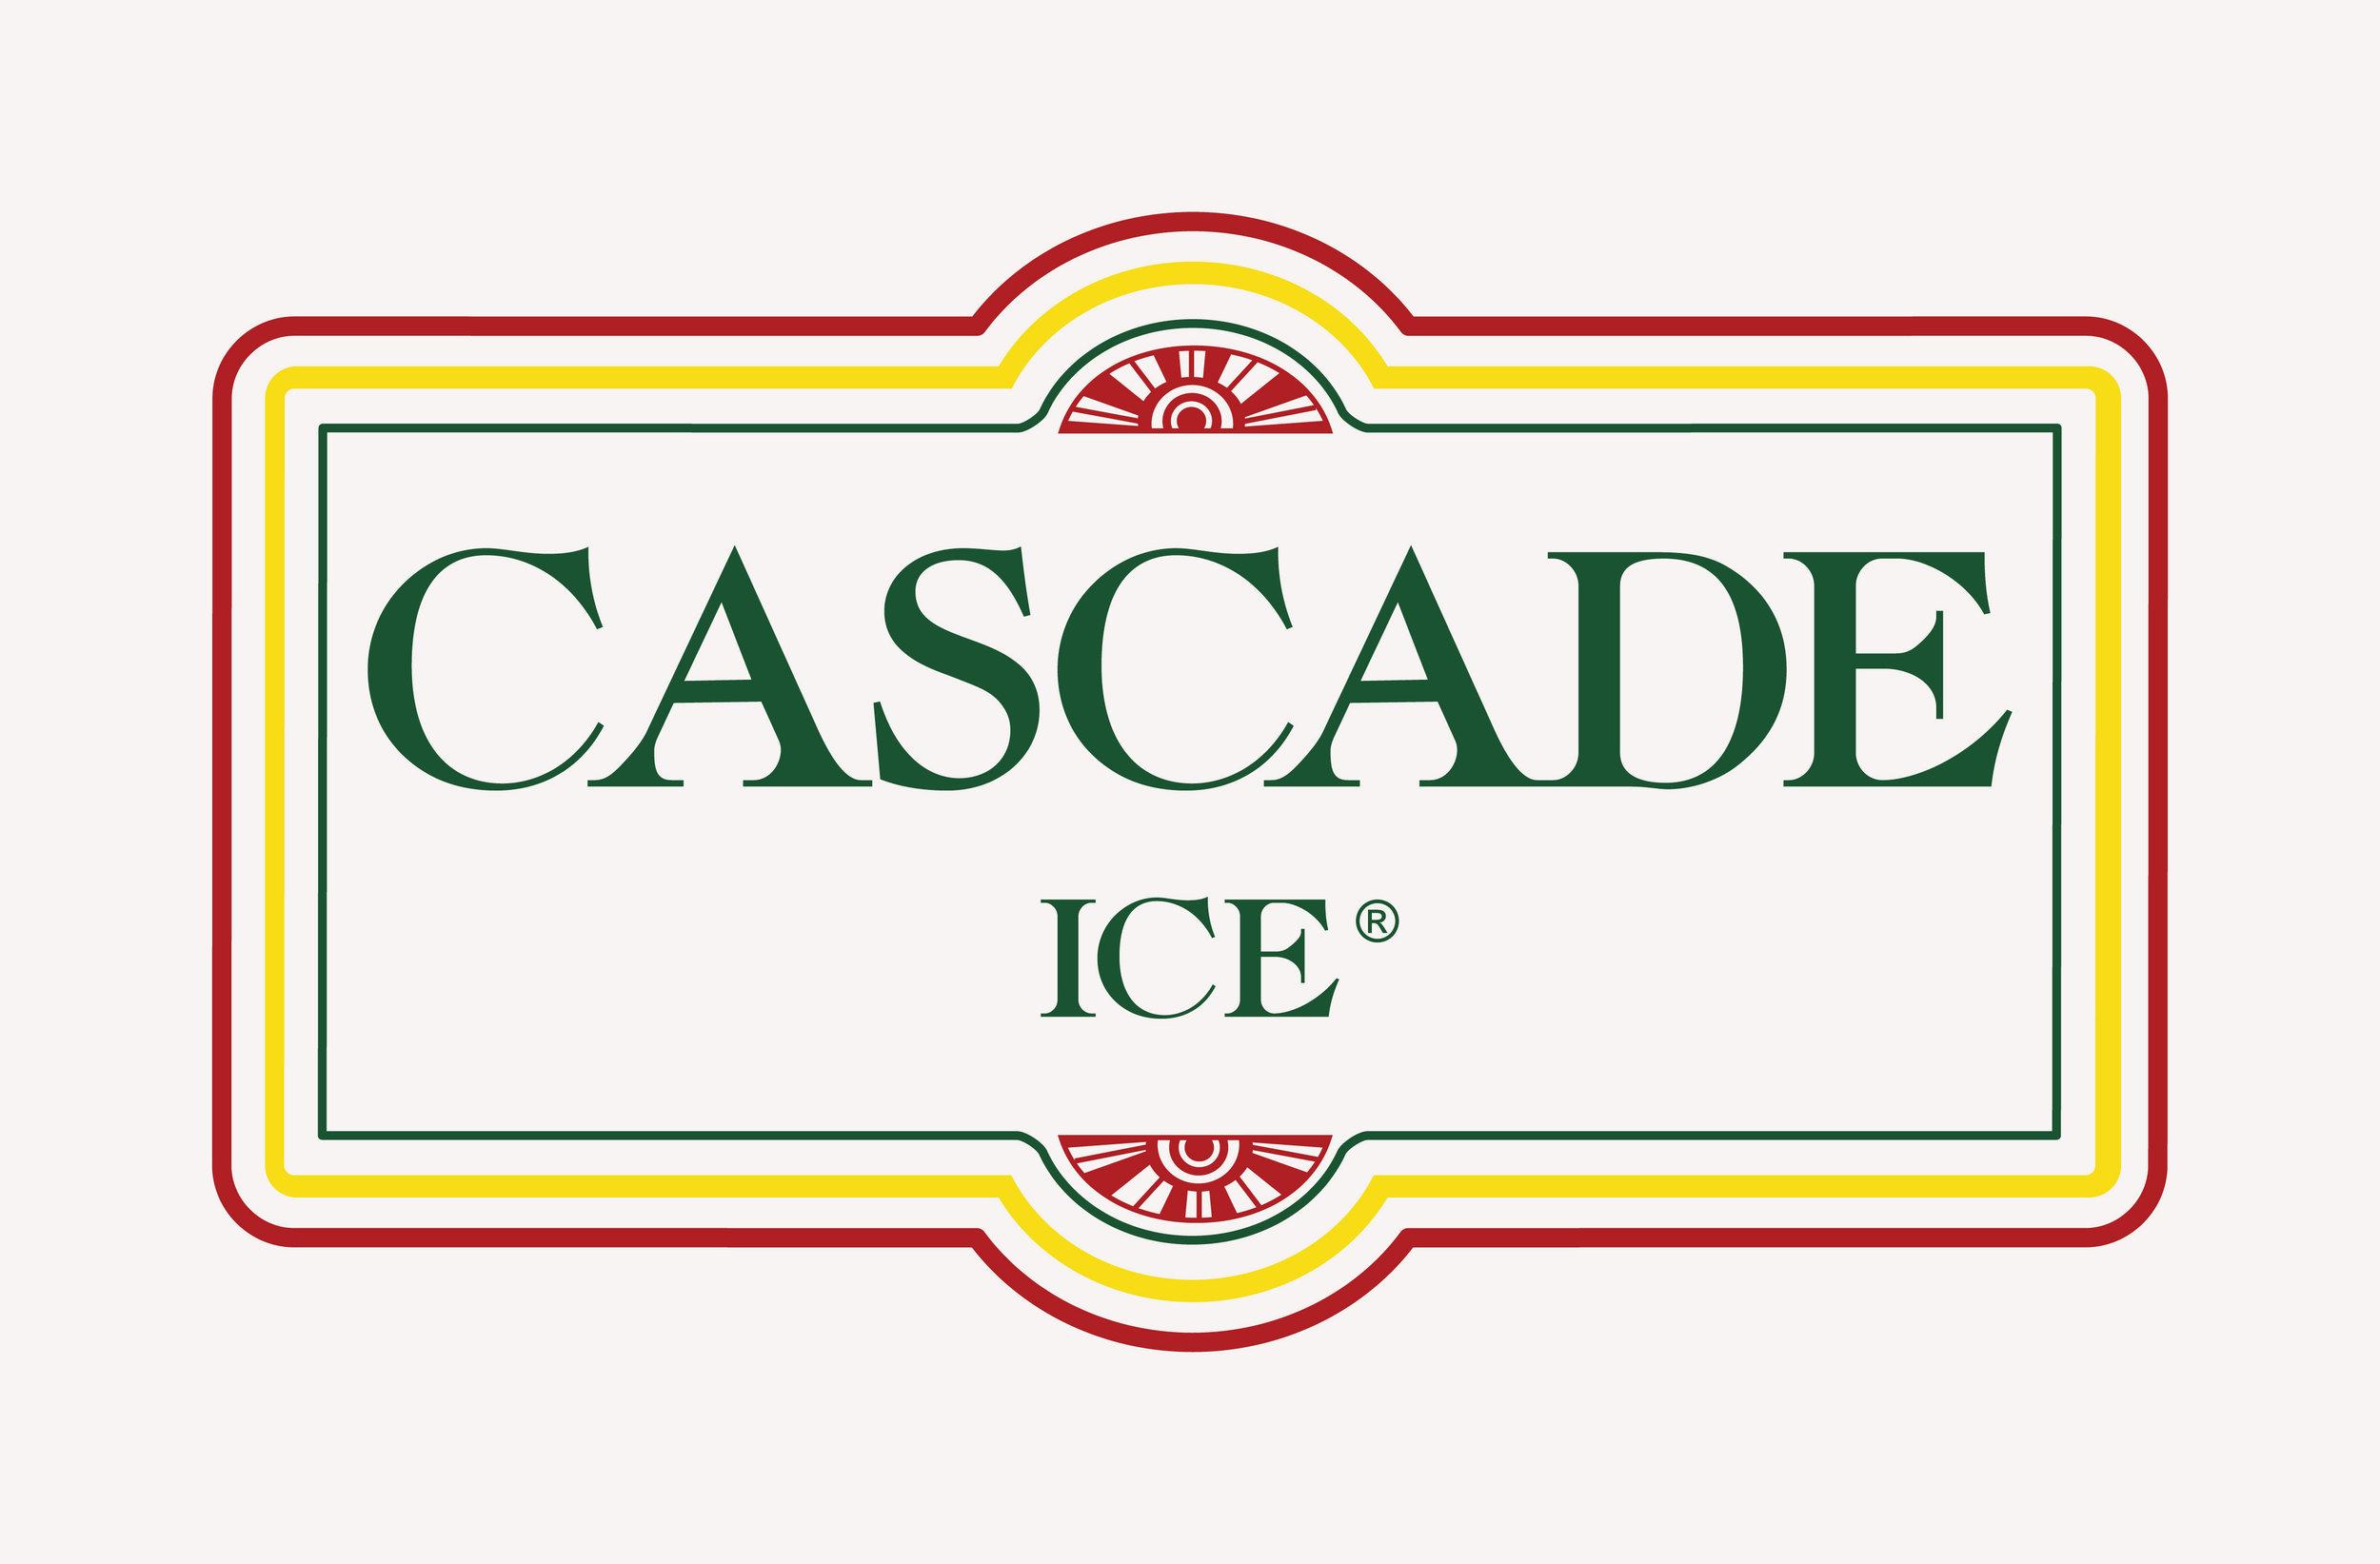 CascadeIce_Logo-w-bckgrnd.jpg